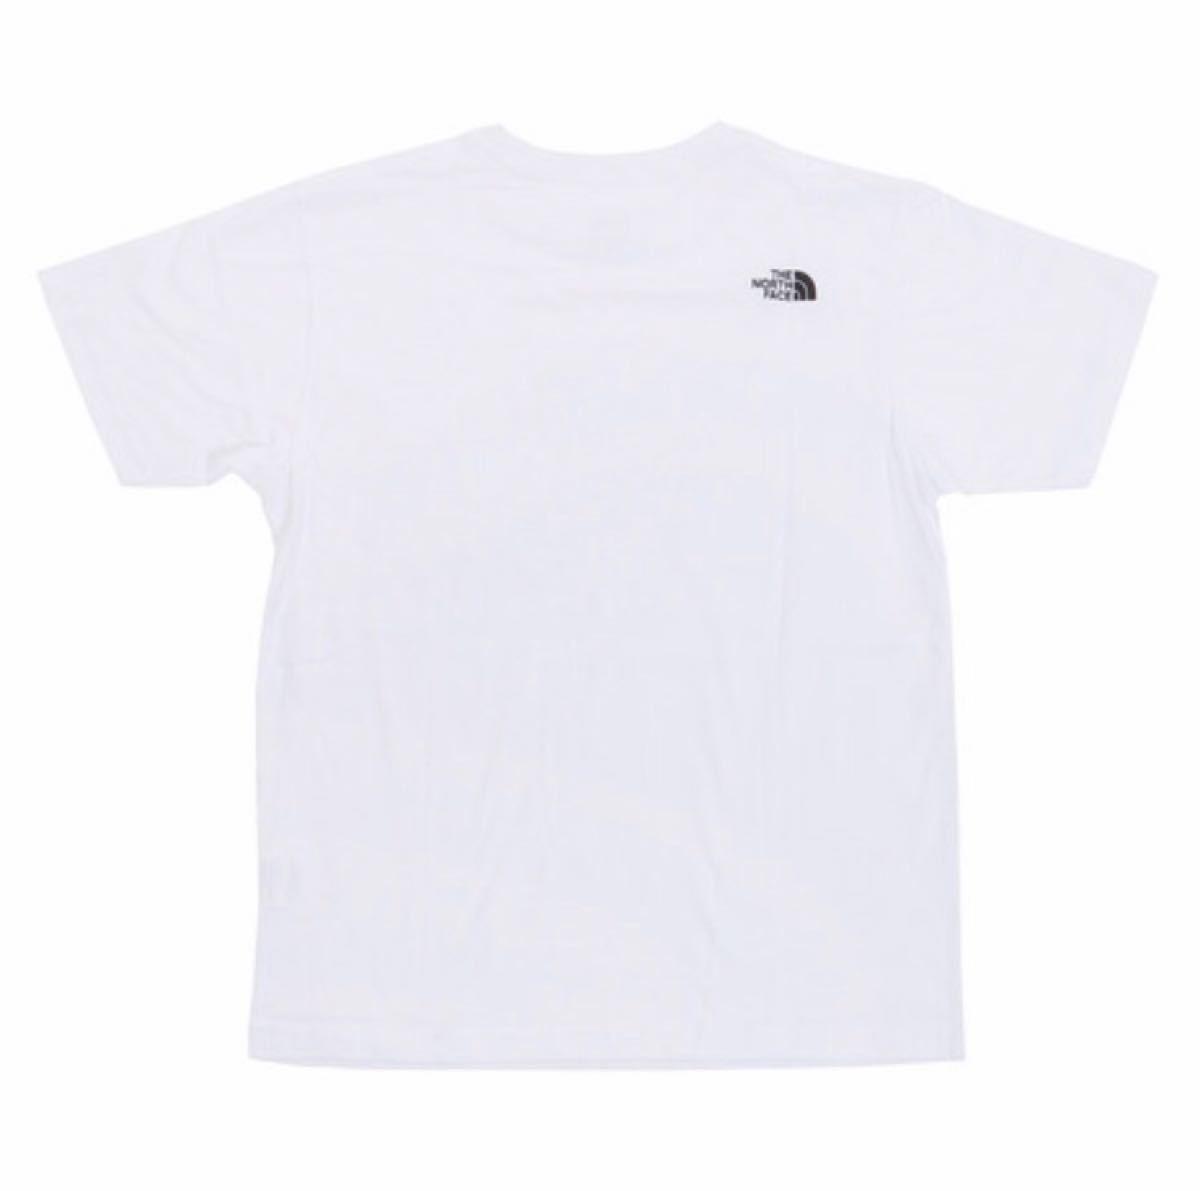 THE NORTH FACE 半袖TシャツL